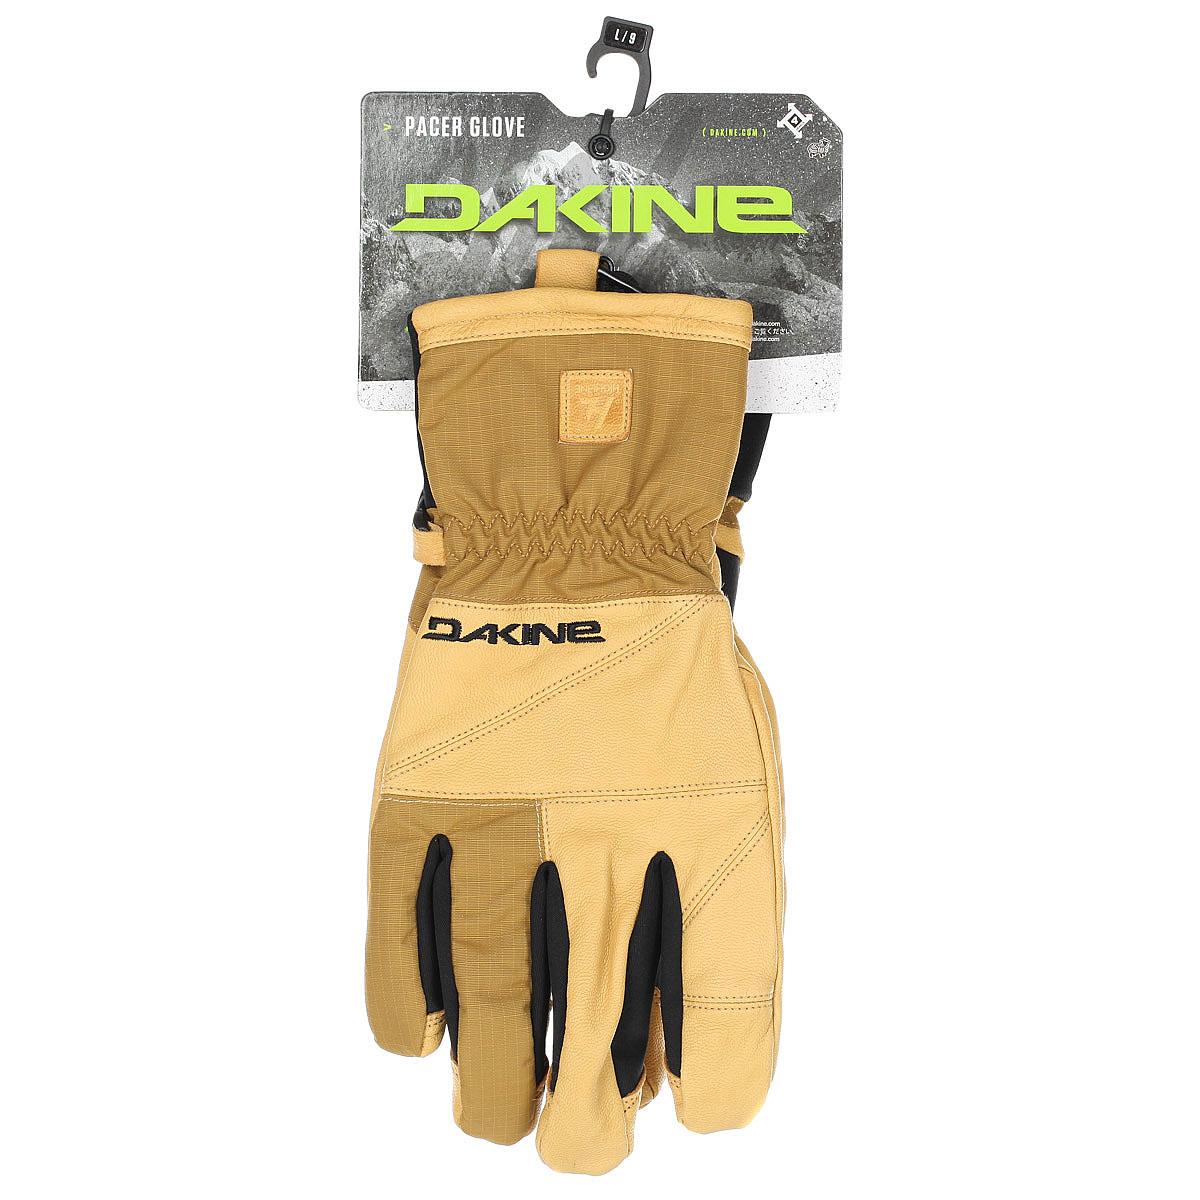 oficjalna strona kup dobrze za kilka dni Перчатки Dakine Pacer Glove Buckskin